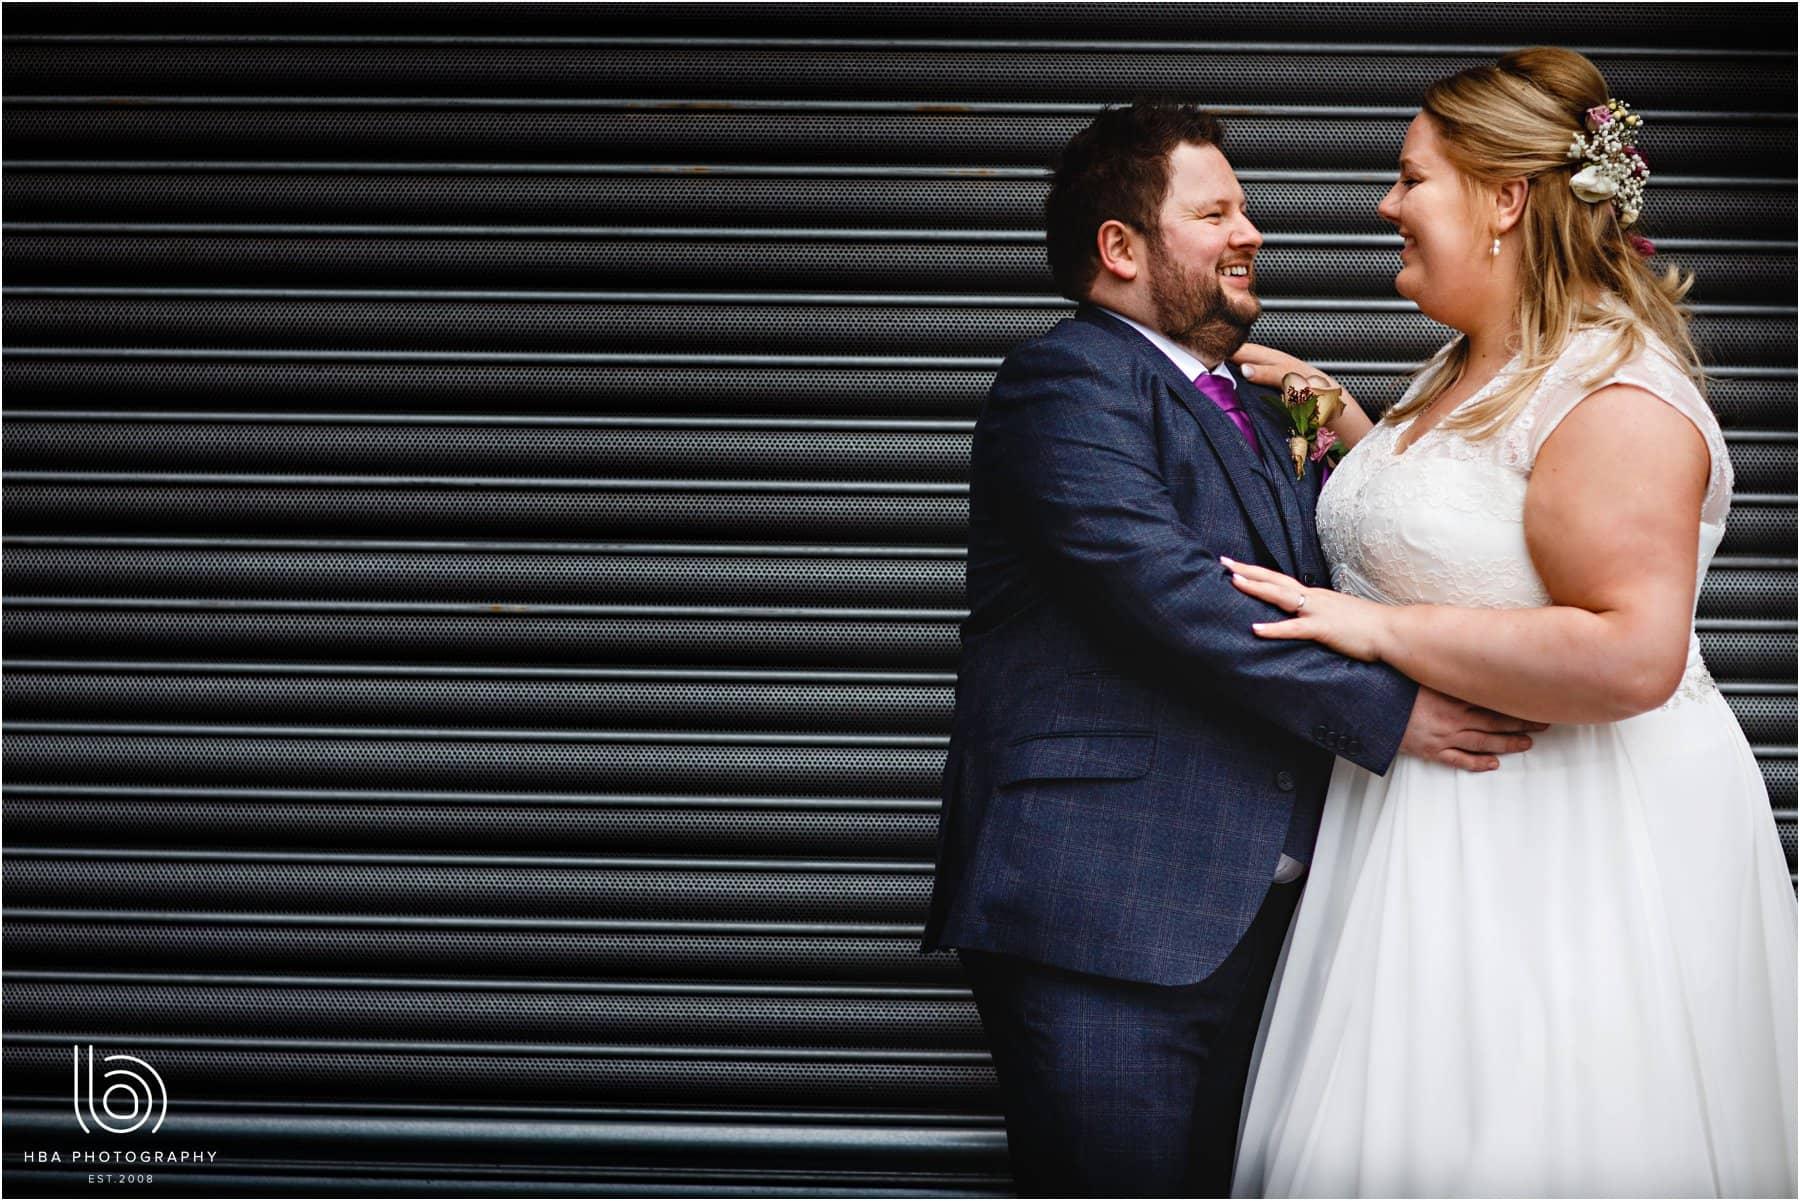 The bride & groom in city centre